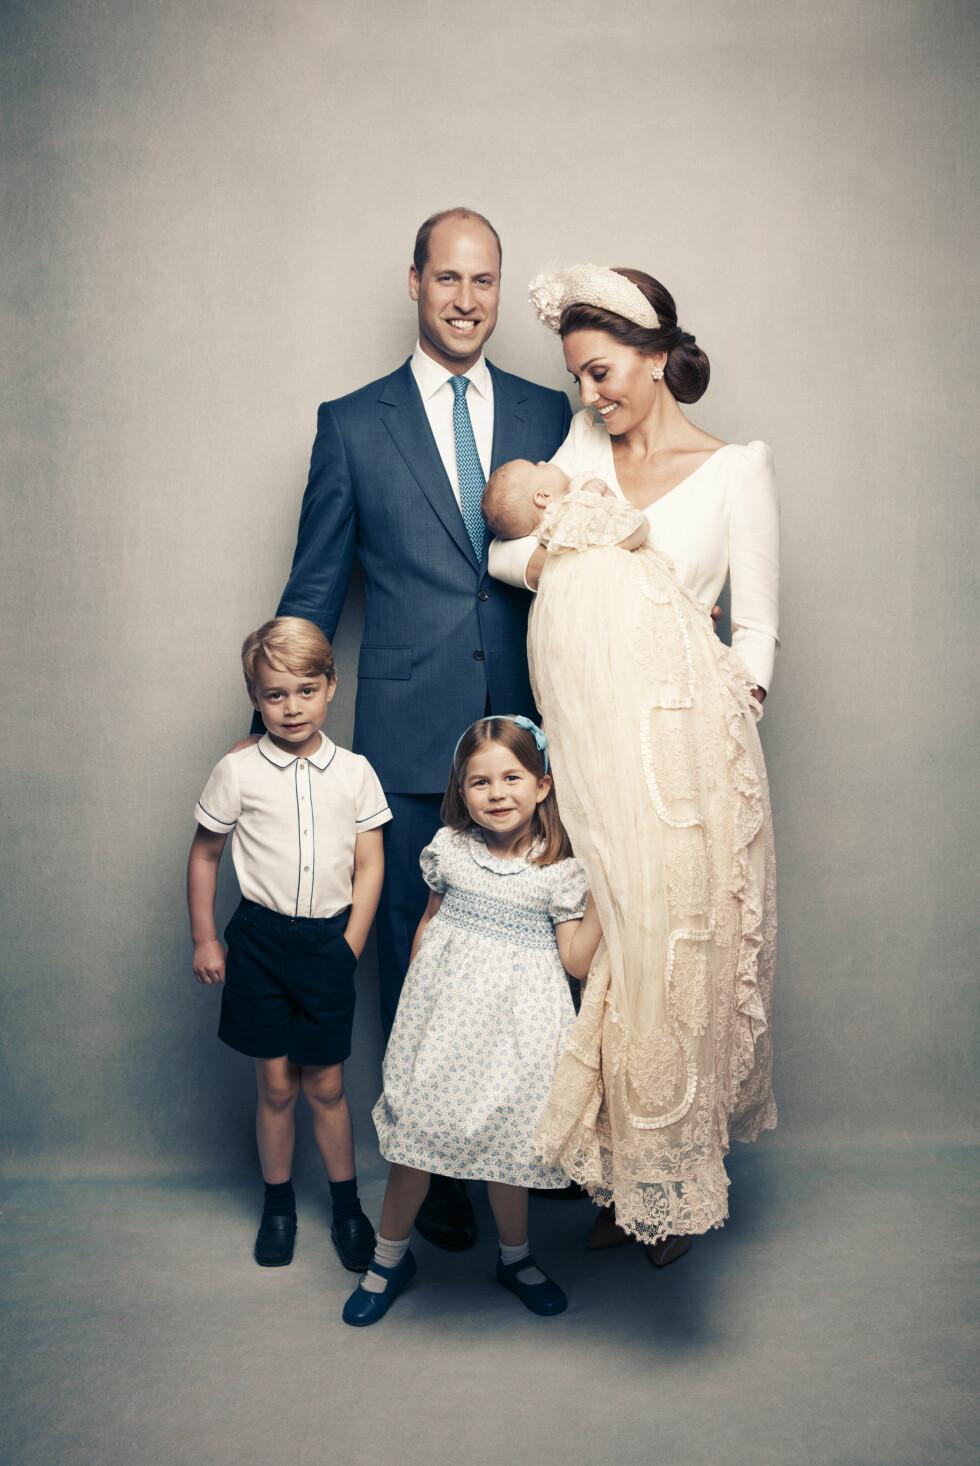 HERTUGFAMILIE: Prins William med kona hertuginne Kate og barna prins George, prinsesse Charlotte og dåpsbarnet prins Louis. FOTO: Matt Holyoak // NTB Scanpix